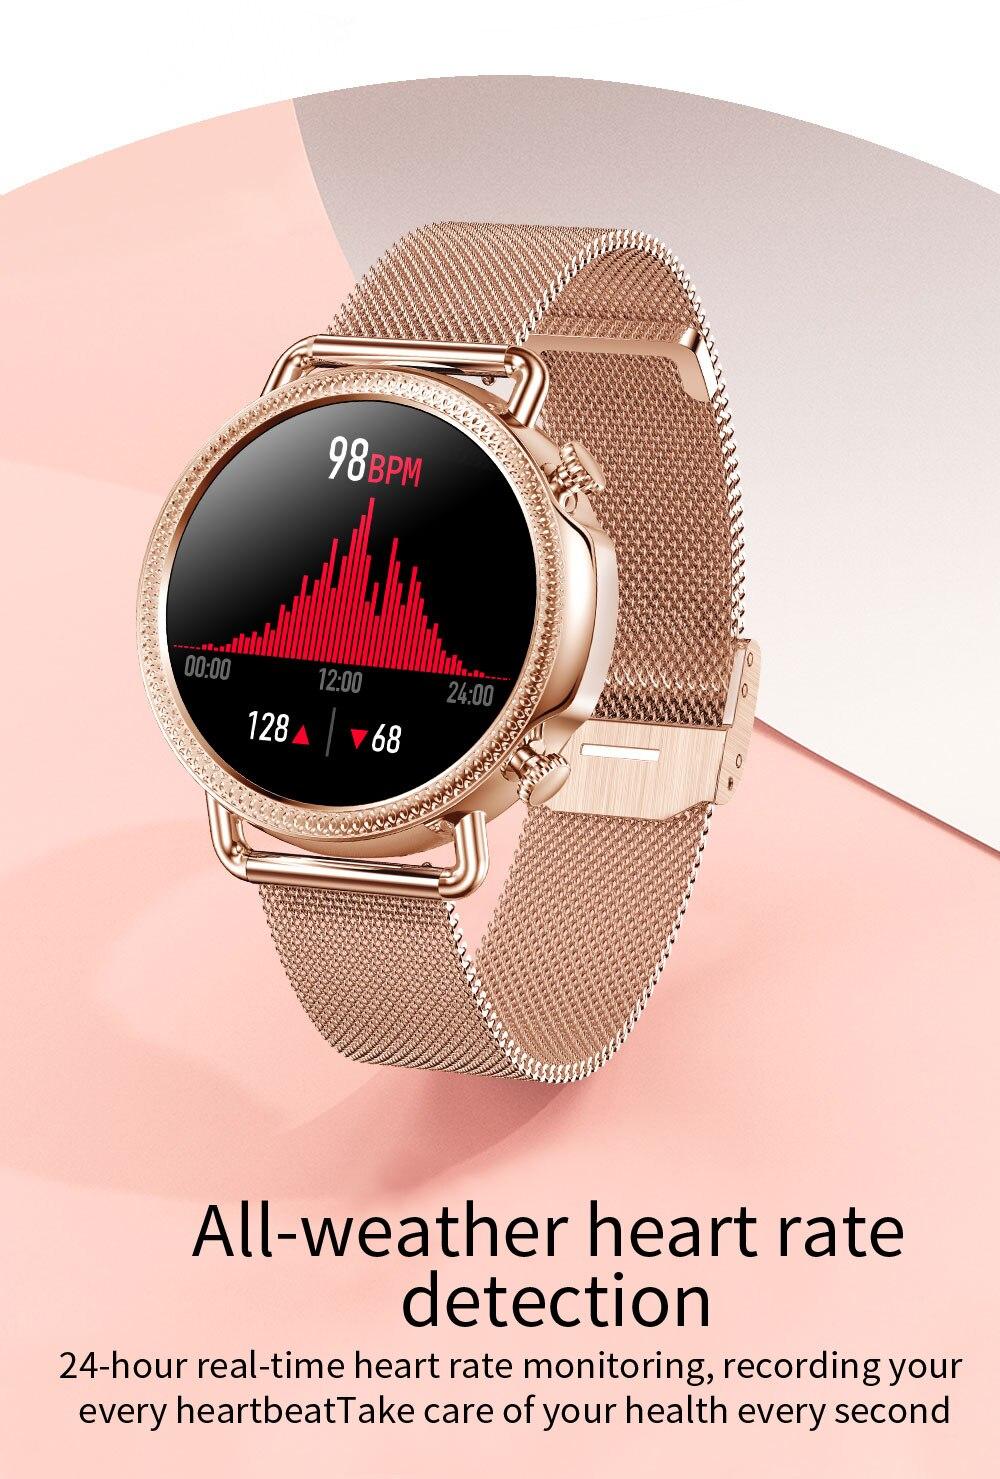 H80c5af2aa849427da31063a5461b6ecfT 2021 Women Smart Watch 1.28 inch HD Screen IP67 Waterproof Lady's Watches Body Temperature Heart Rate Monitor PK V23